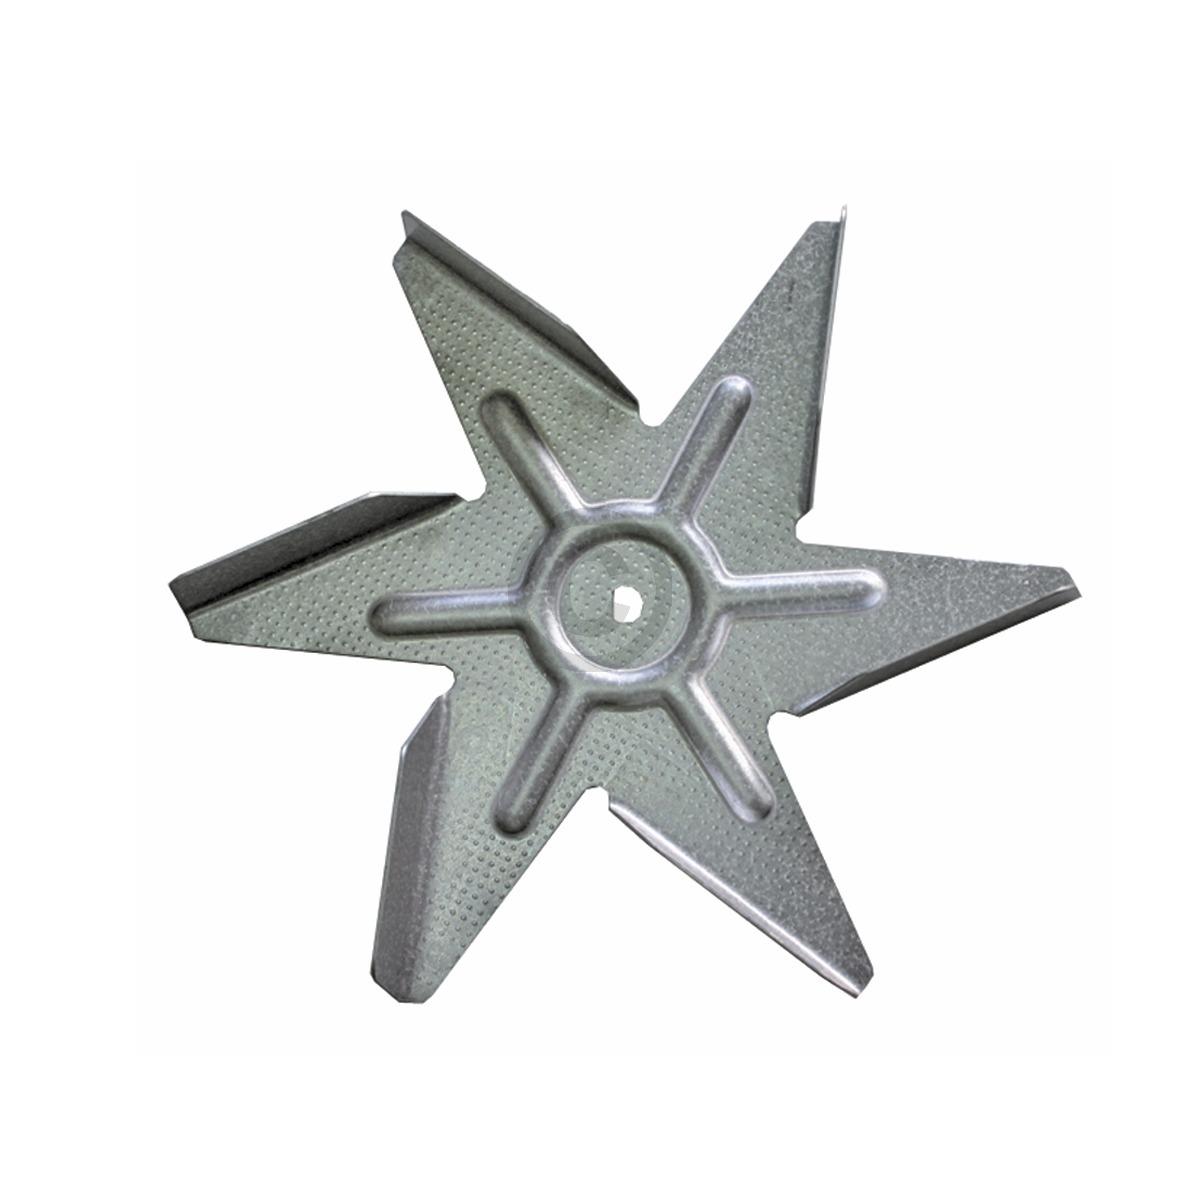 Flügel für Heißluftherdventilator, Universal! 617771 Bauknecht, Whirlpool, Ikea